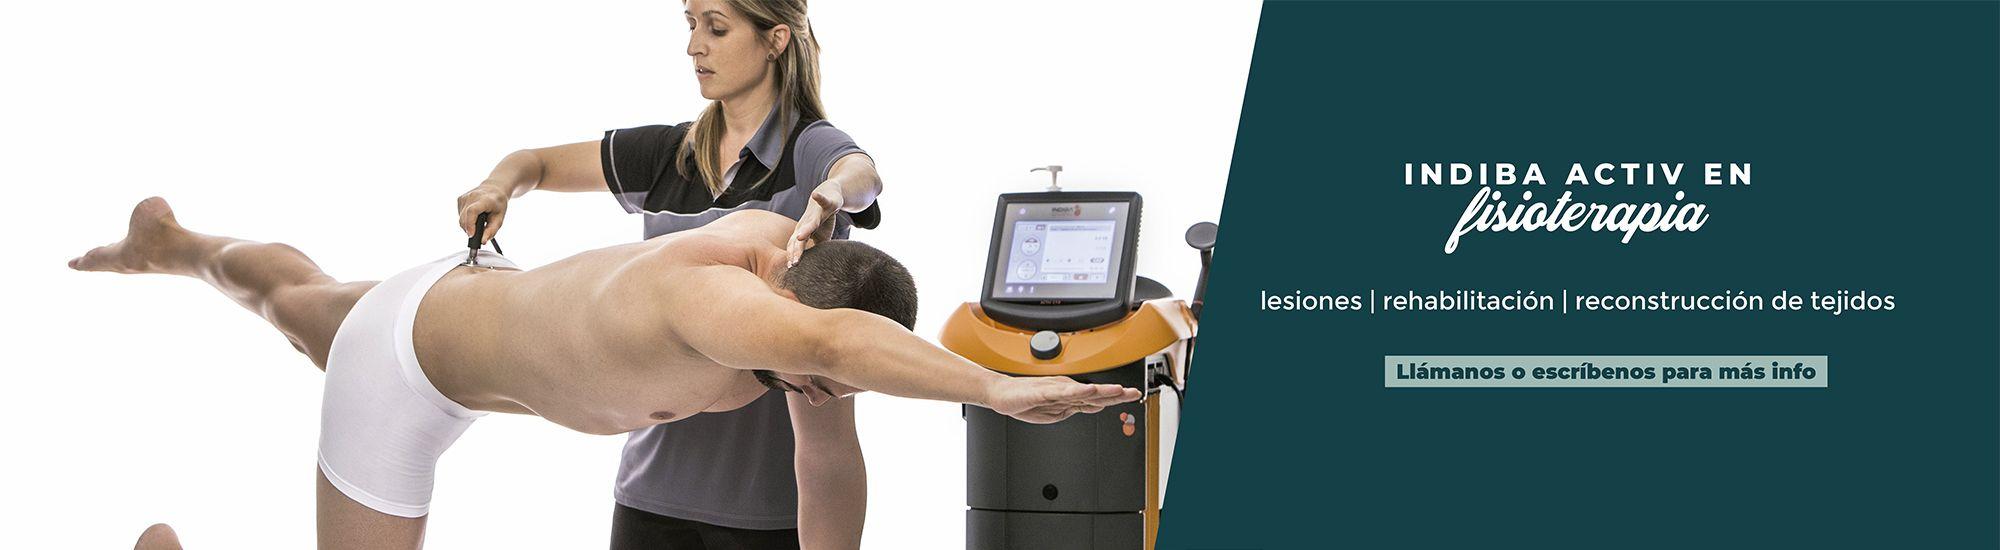 slider indiba activ fisioterapia fisioclinics bilbao